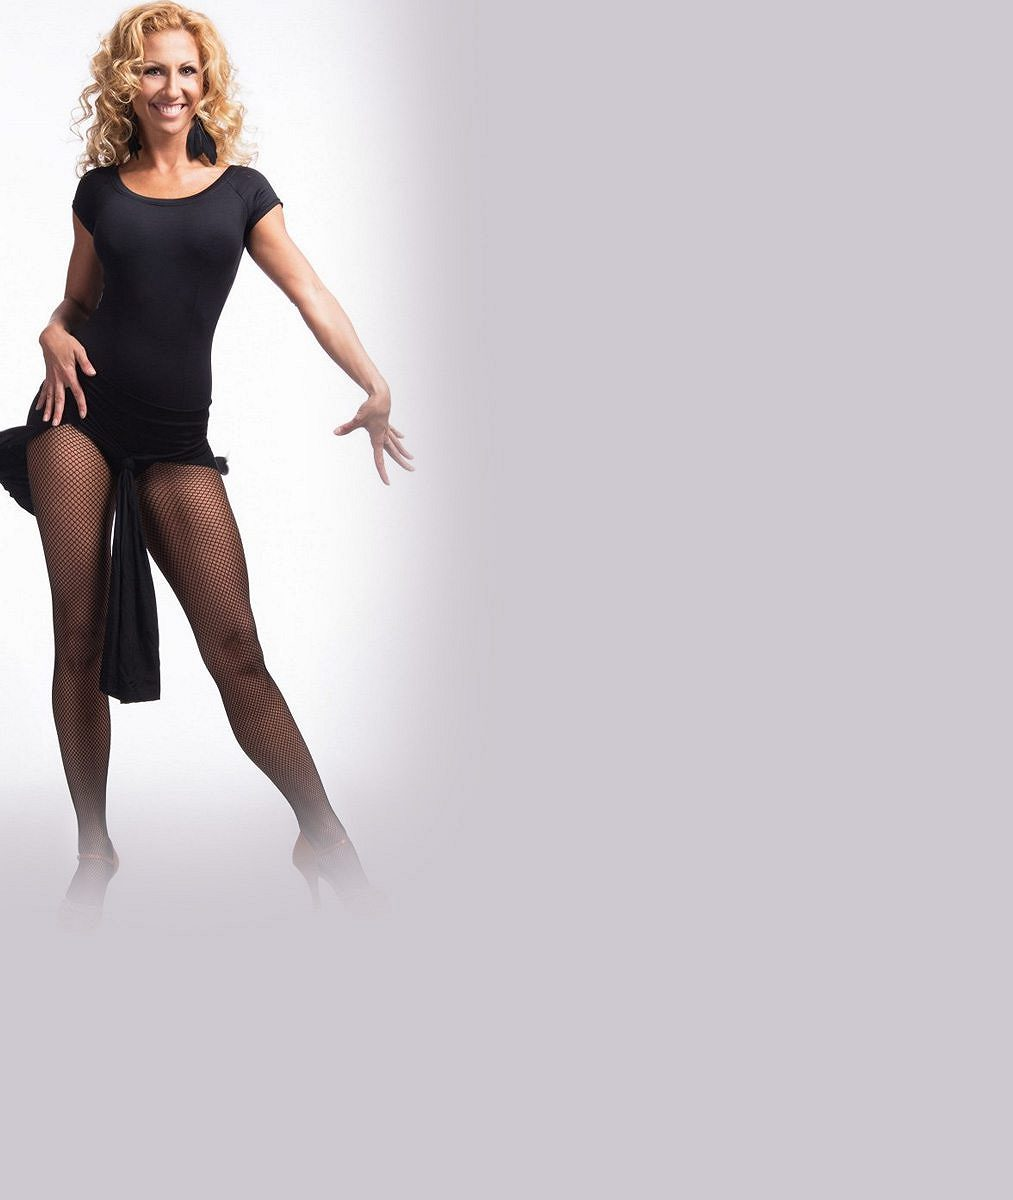 Bankova sexy tanečnice ze StarDance šla do plavek: Postavu má dokonalou!